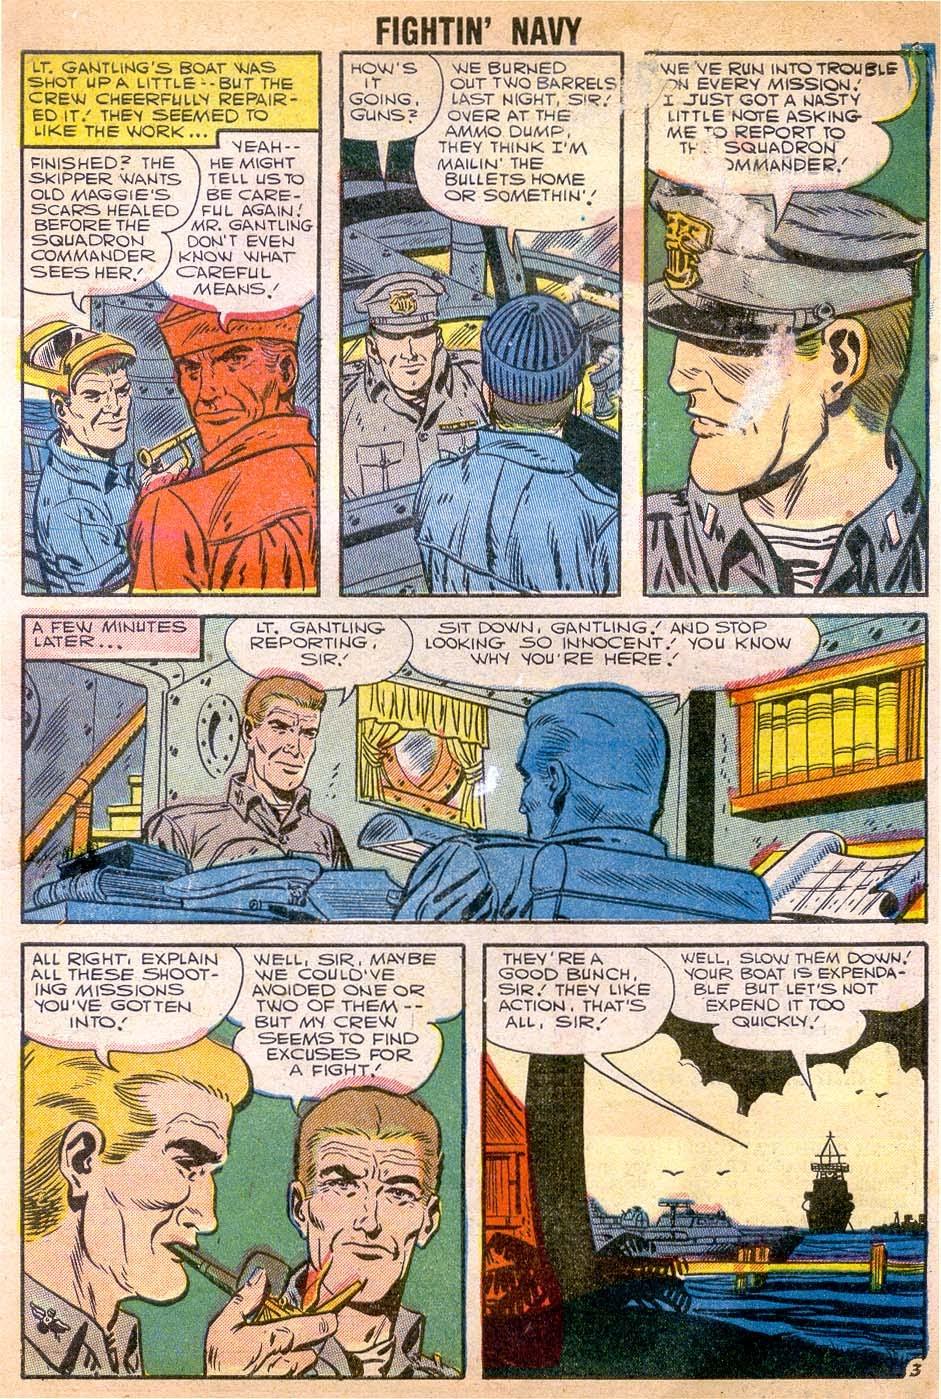 Read online Fightin' Navy comic -  Issue #79 - 5